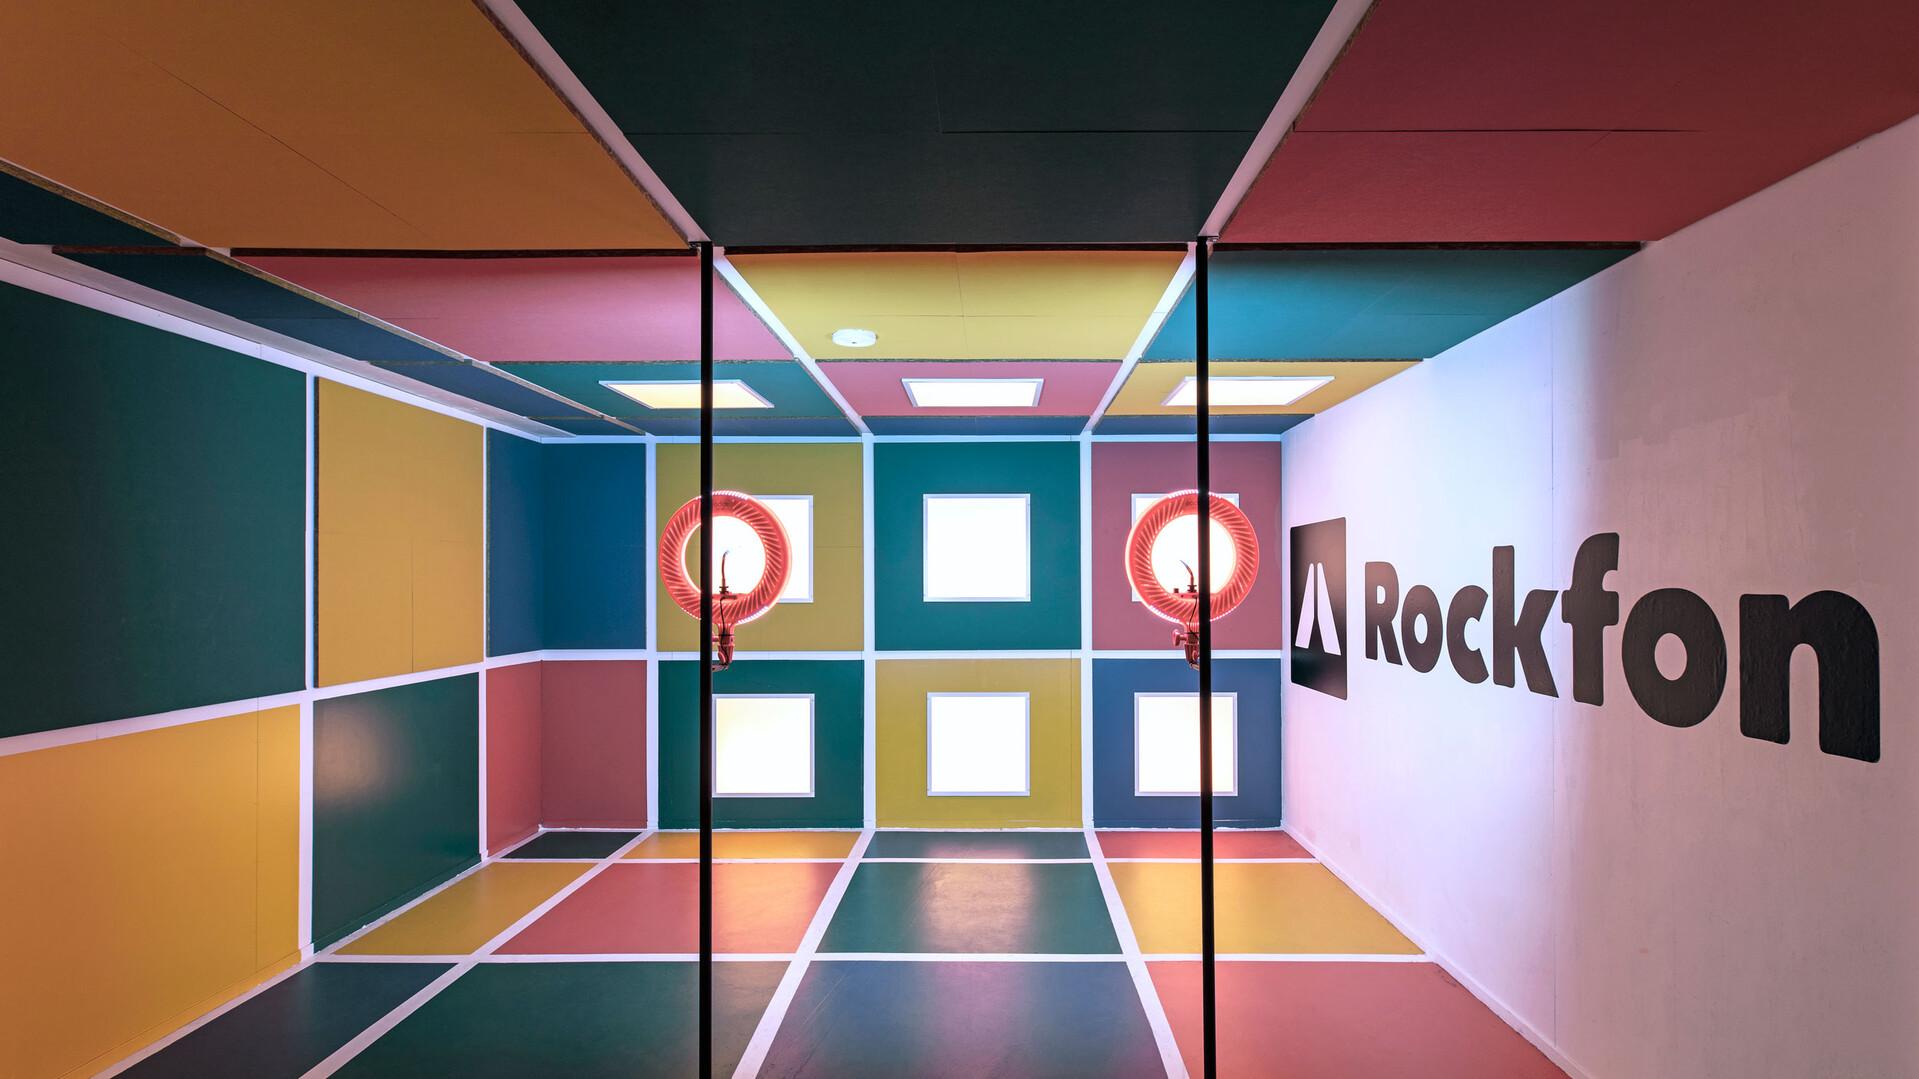 2500x1406px_New-Rockfon-Color-all